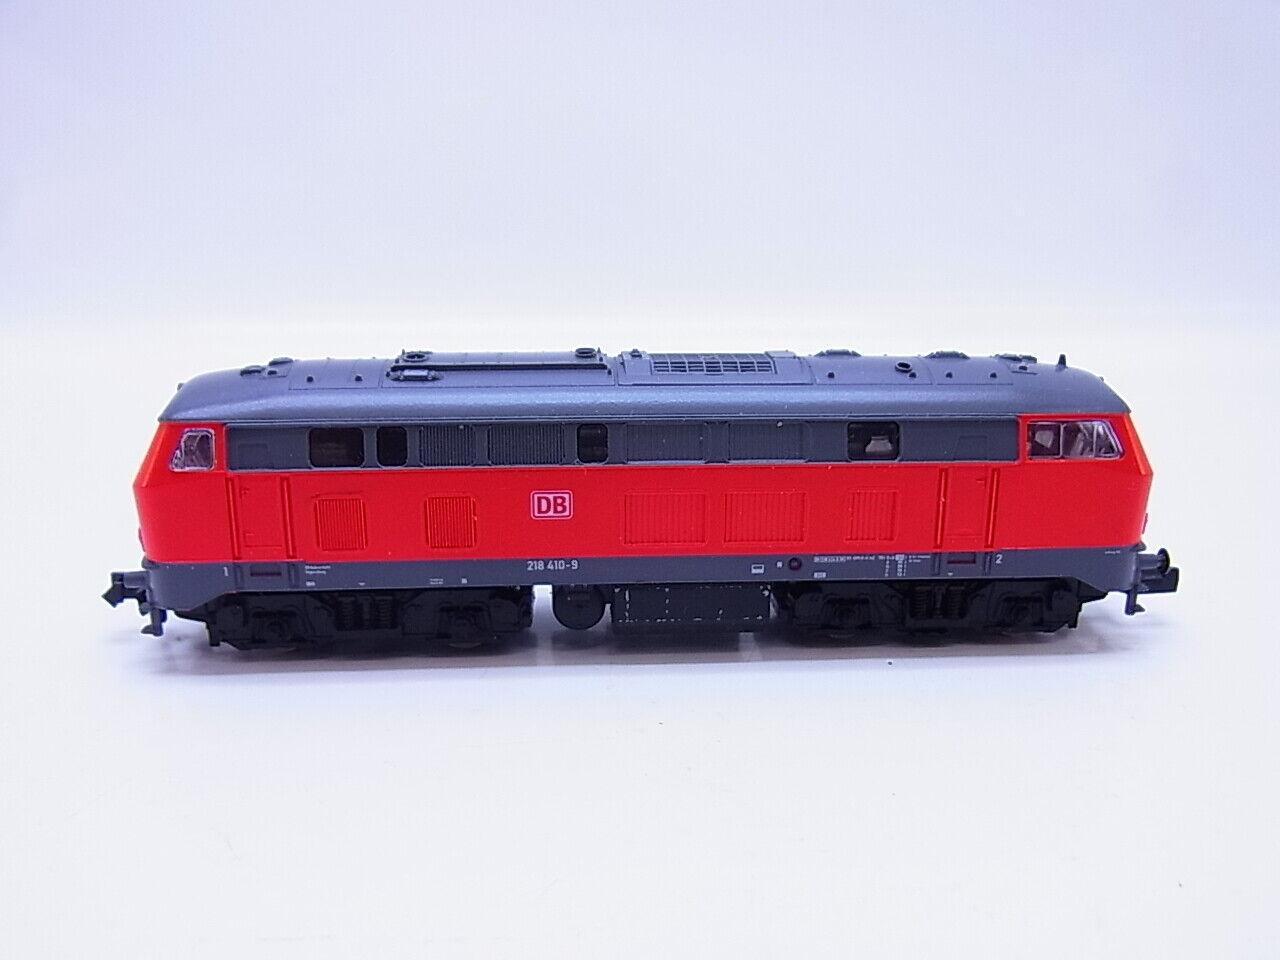 Lot 56152   Fleischmann diesellok br 218 410-9 de la DB para pista n en Box